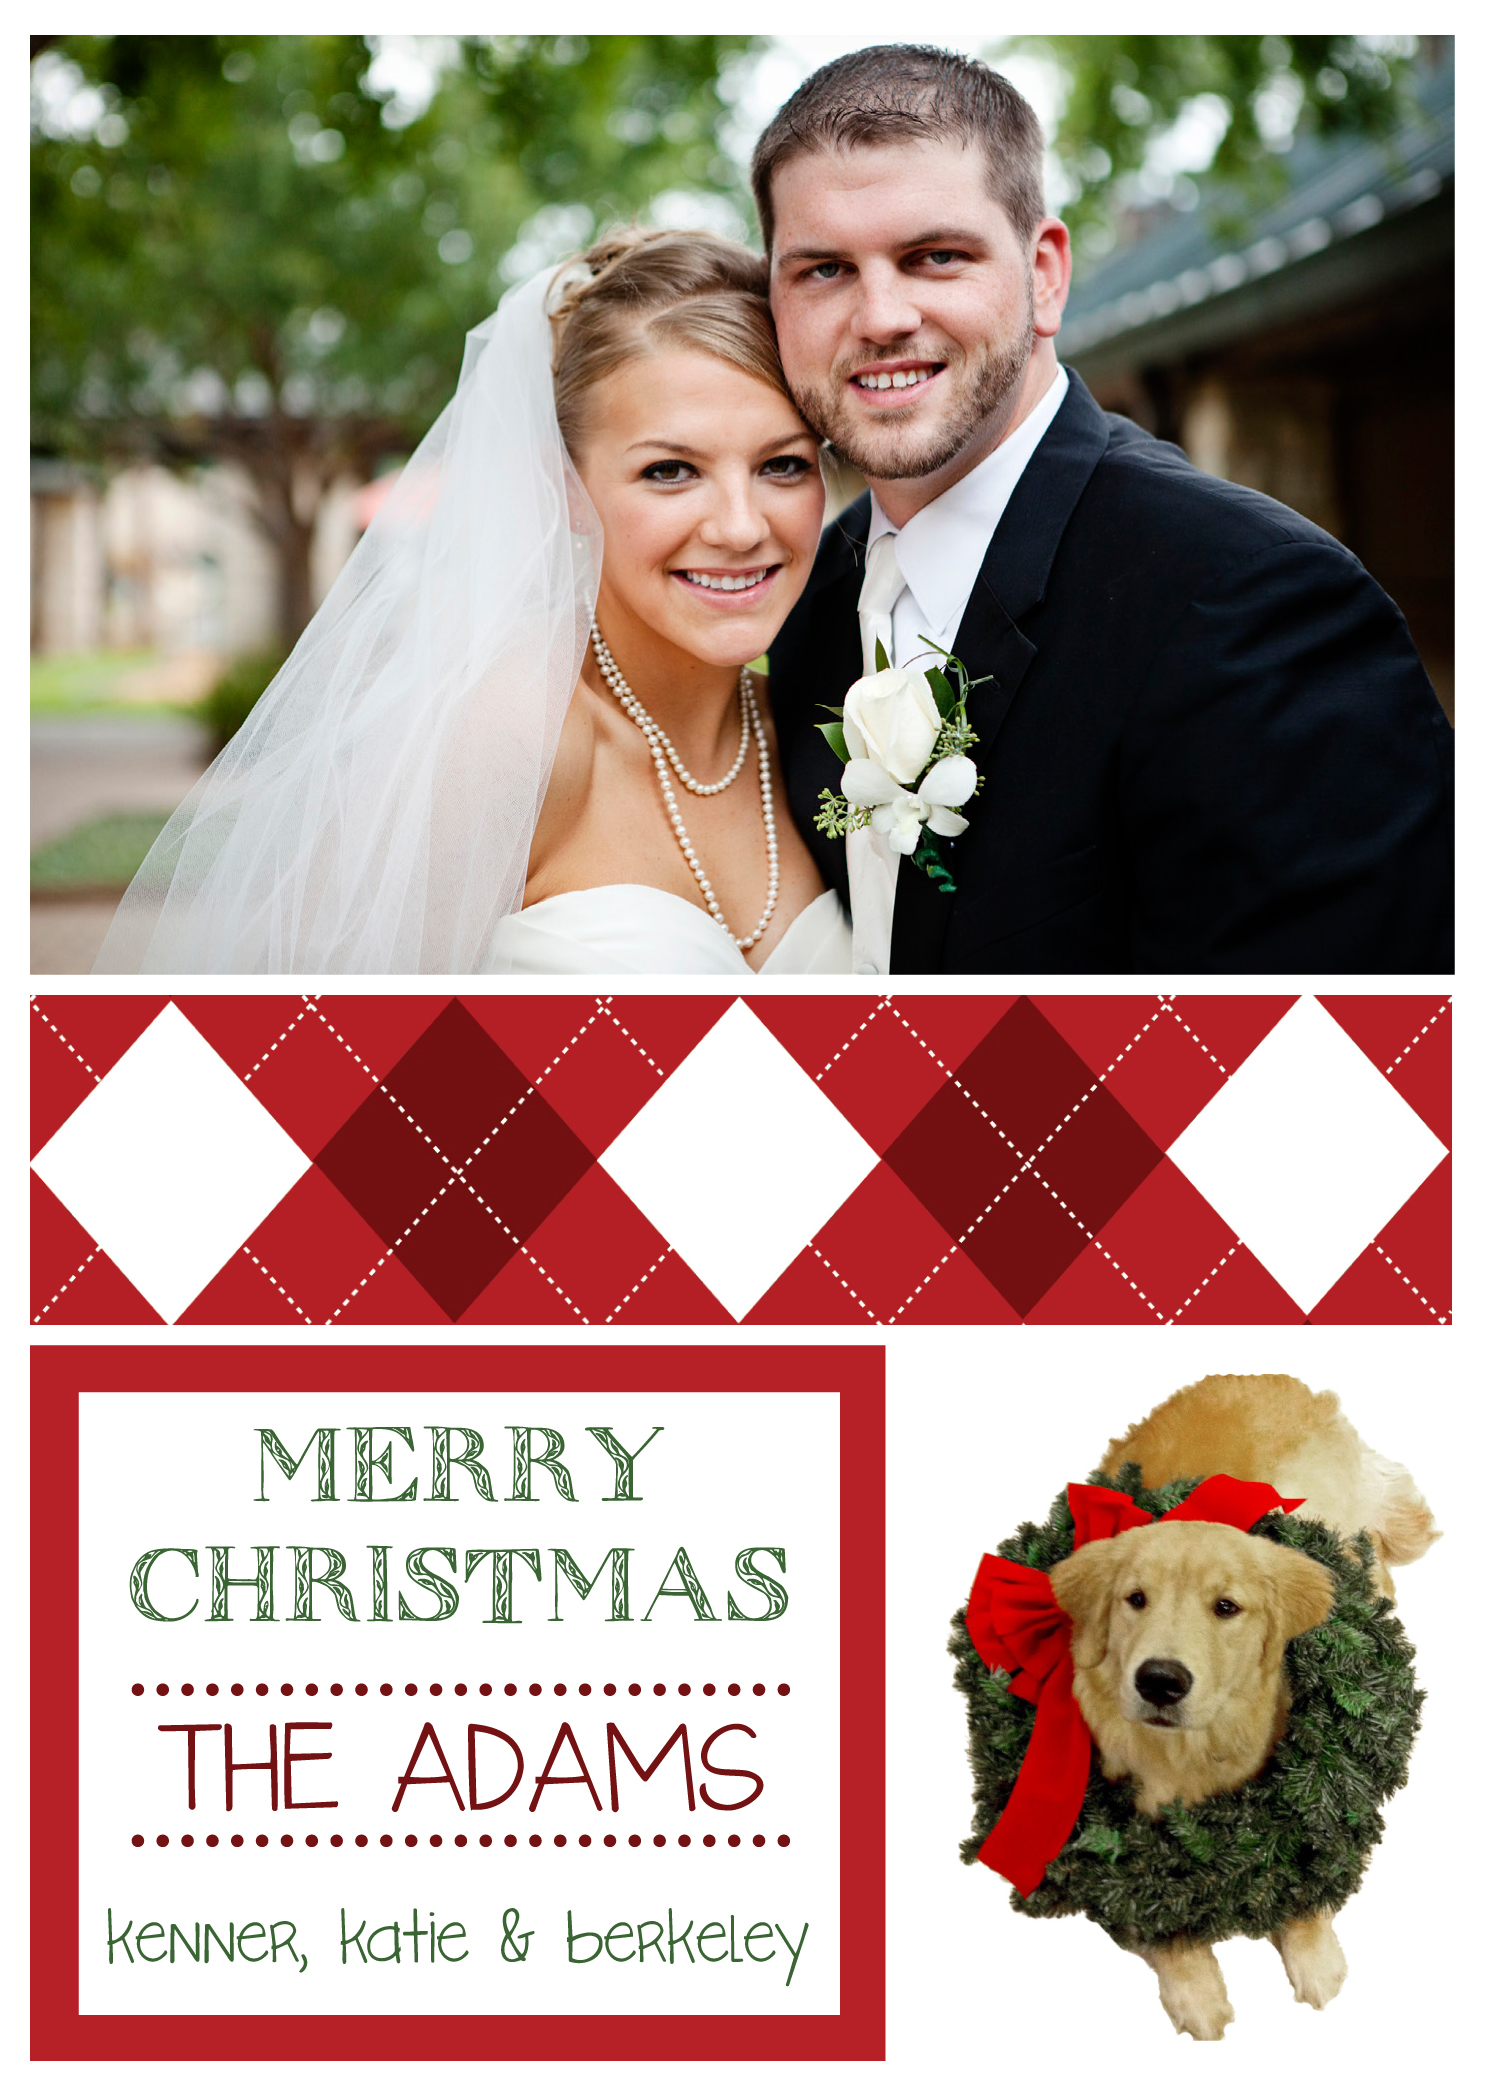 Adams Christmas Card.jpg